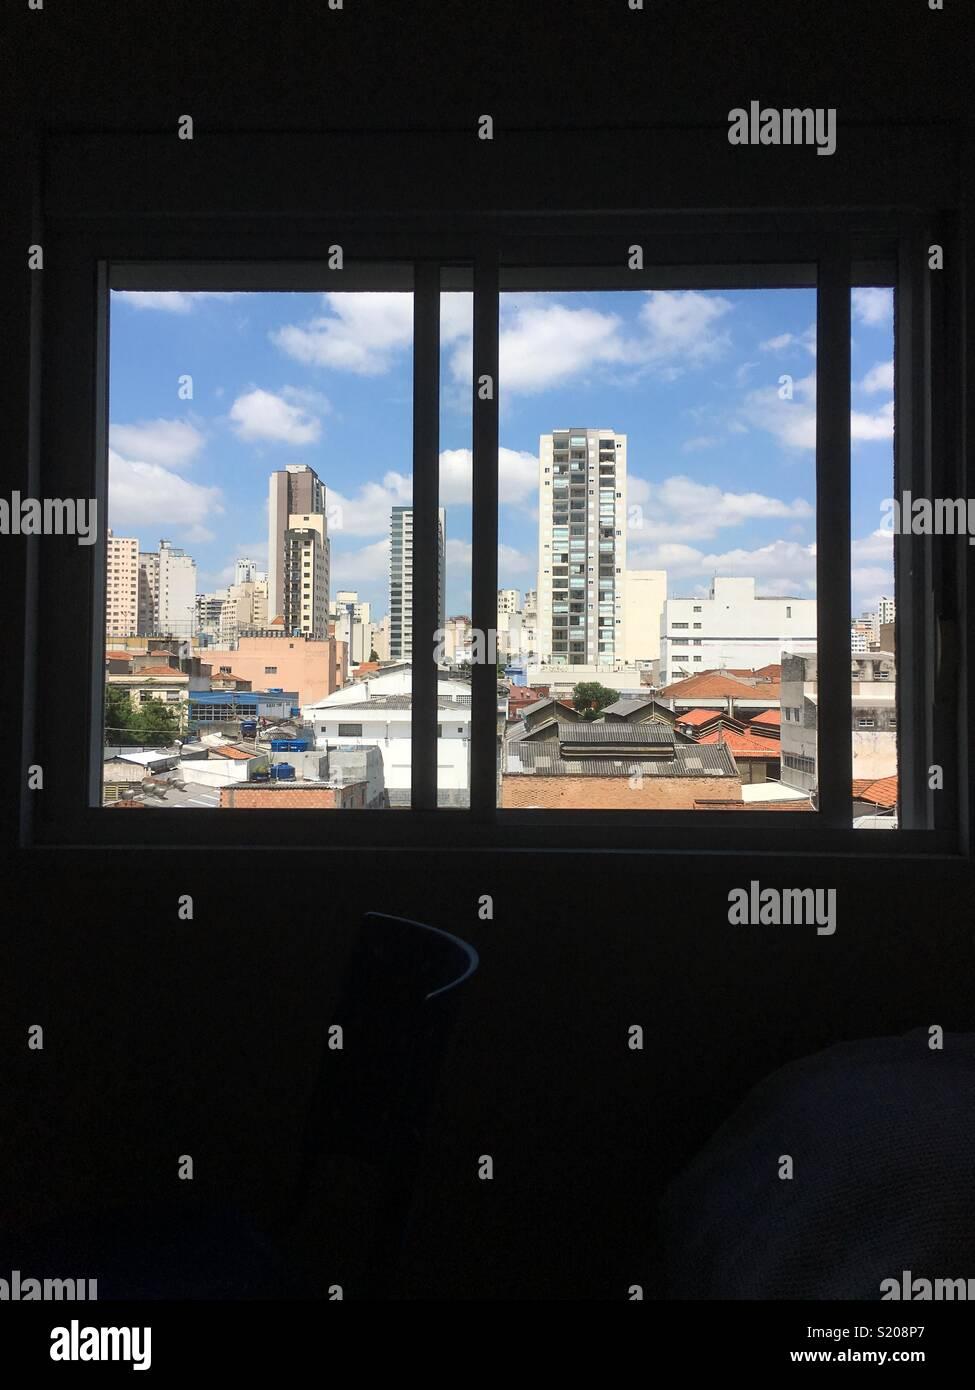 window view - Stock Image